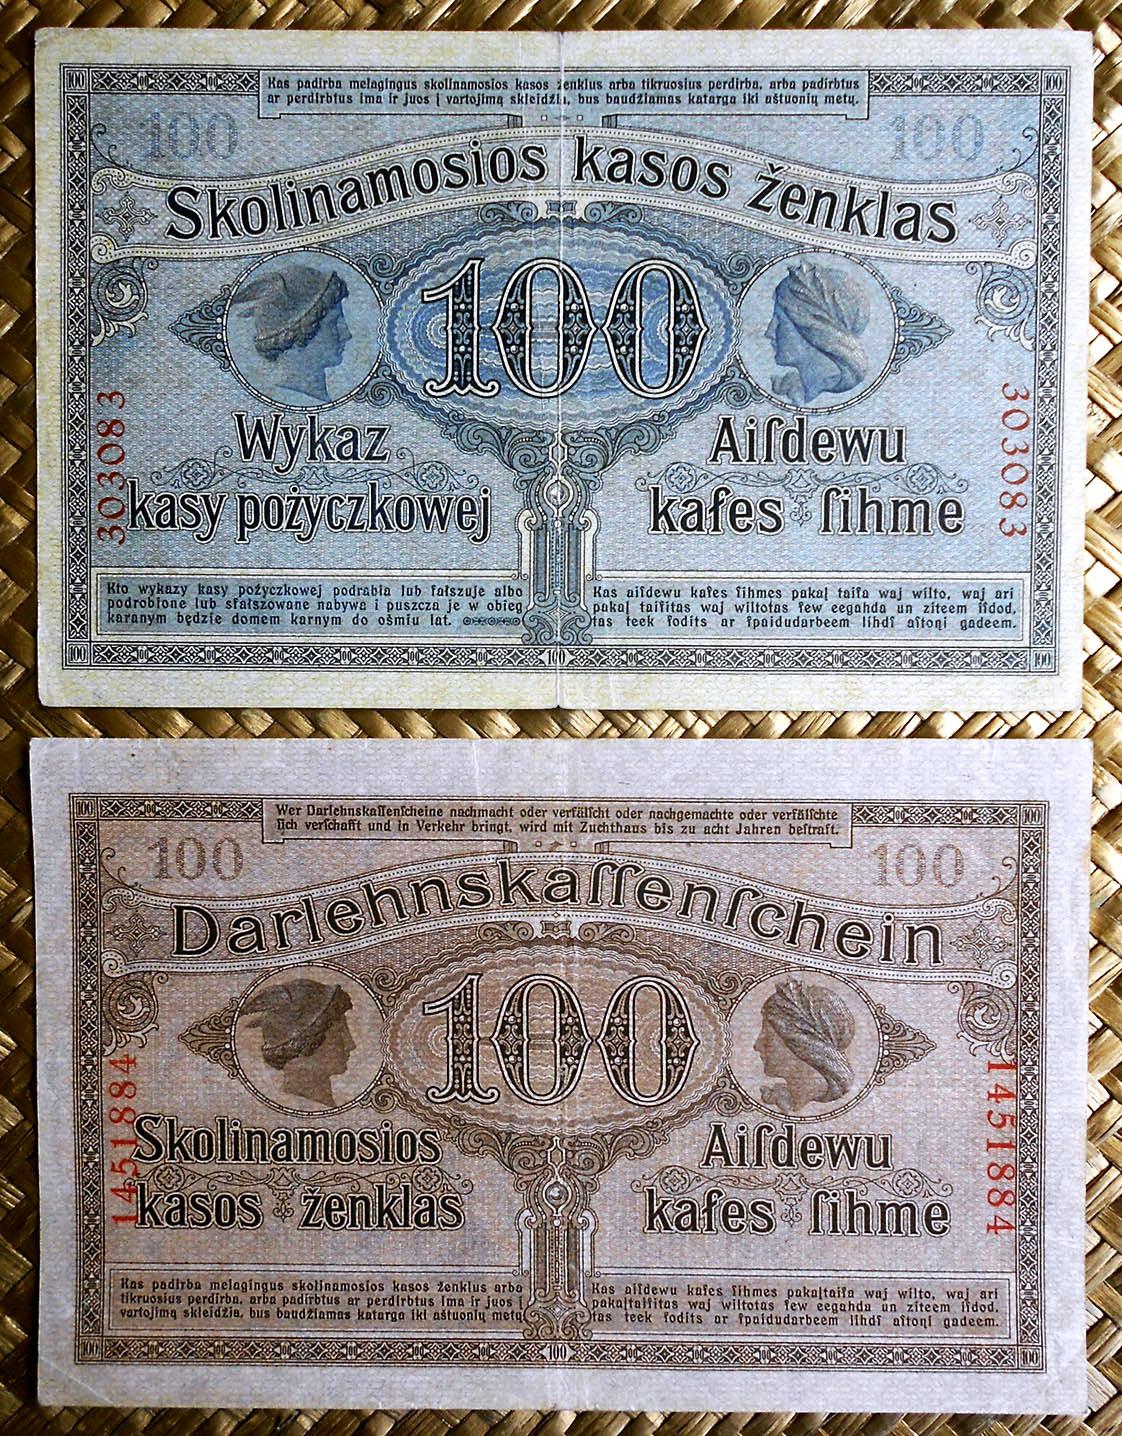 Europa oriental Ocup. alemana WWI Posen 100 rublos 1916 vs. Kowno 100 marcos 1918 reversos